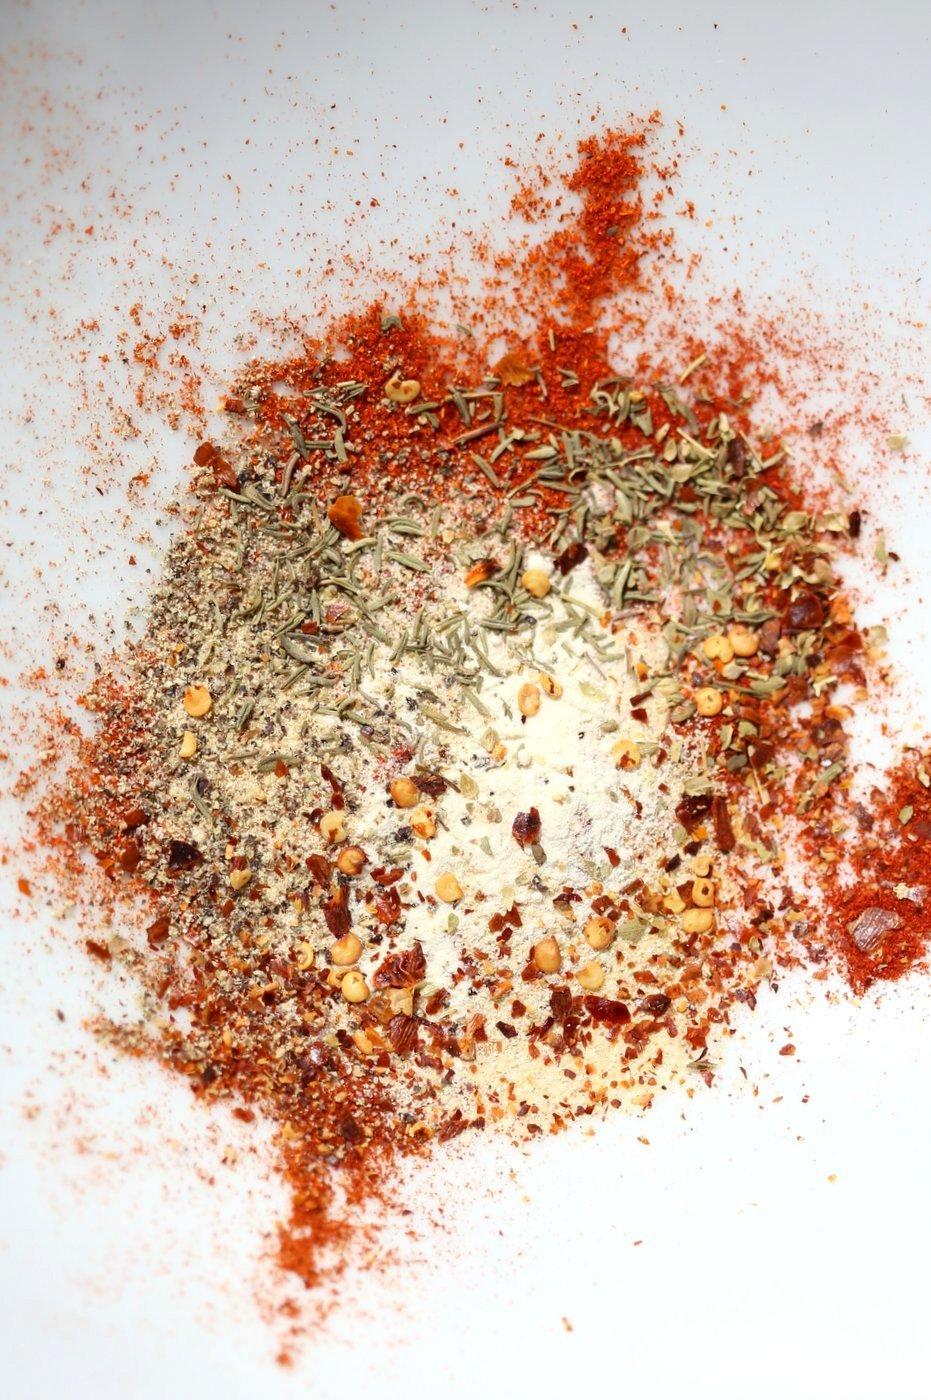 Cajun Spice Recipe. Make your own Cajun seasoning. How to make Cajun spice. Vegan Gluten-free Recipe | VeganRicha.com